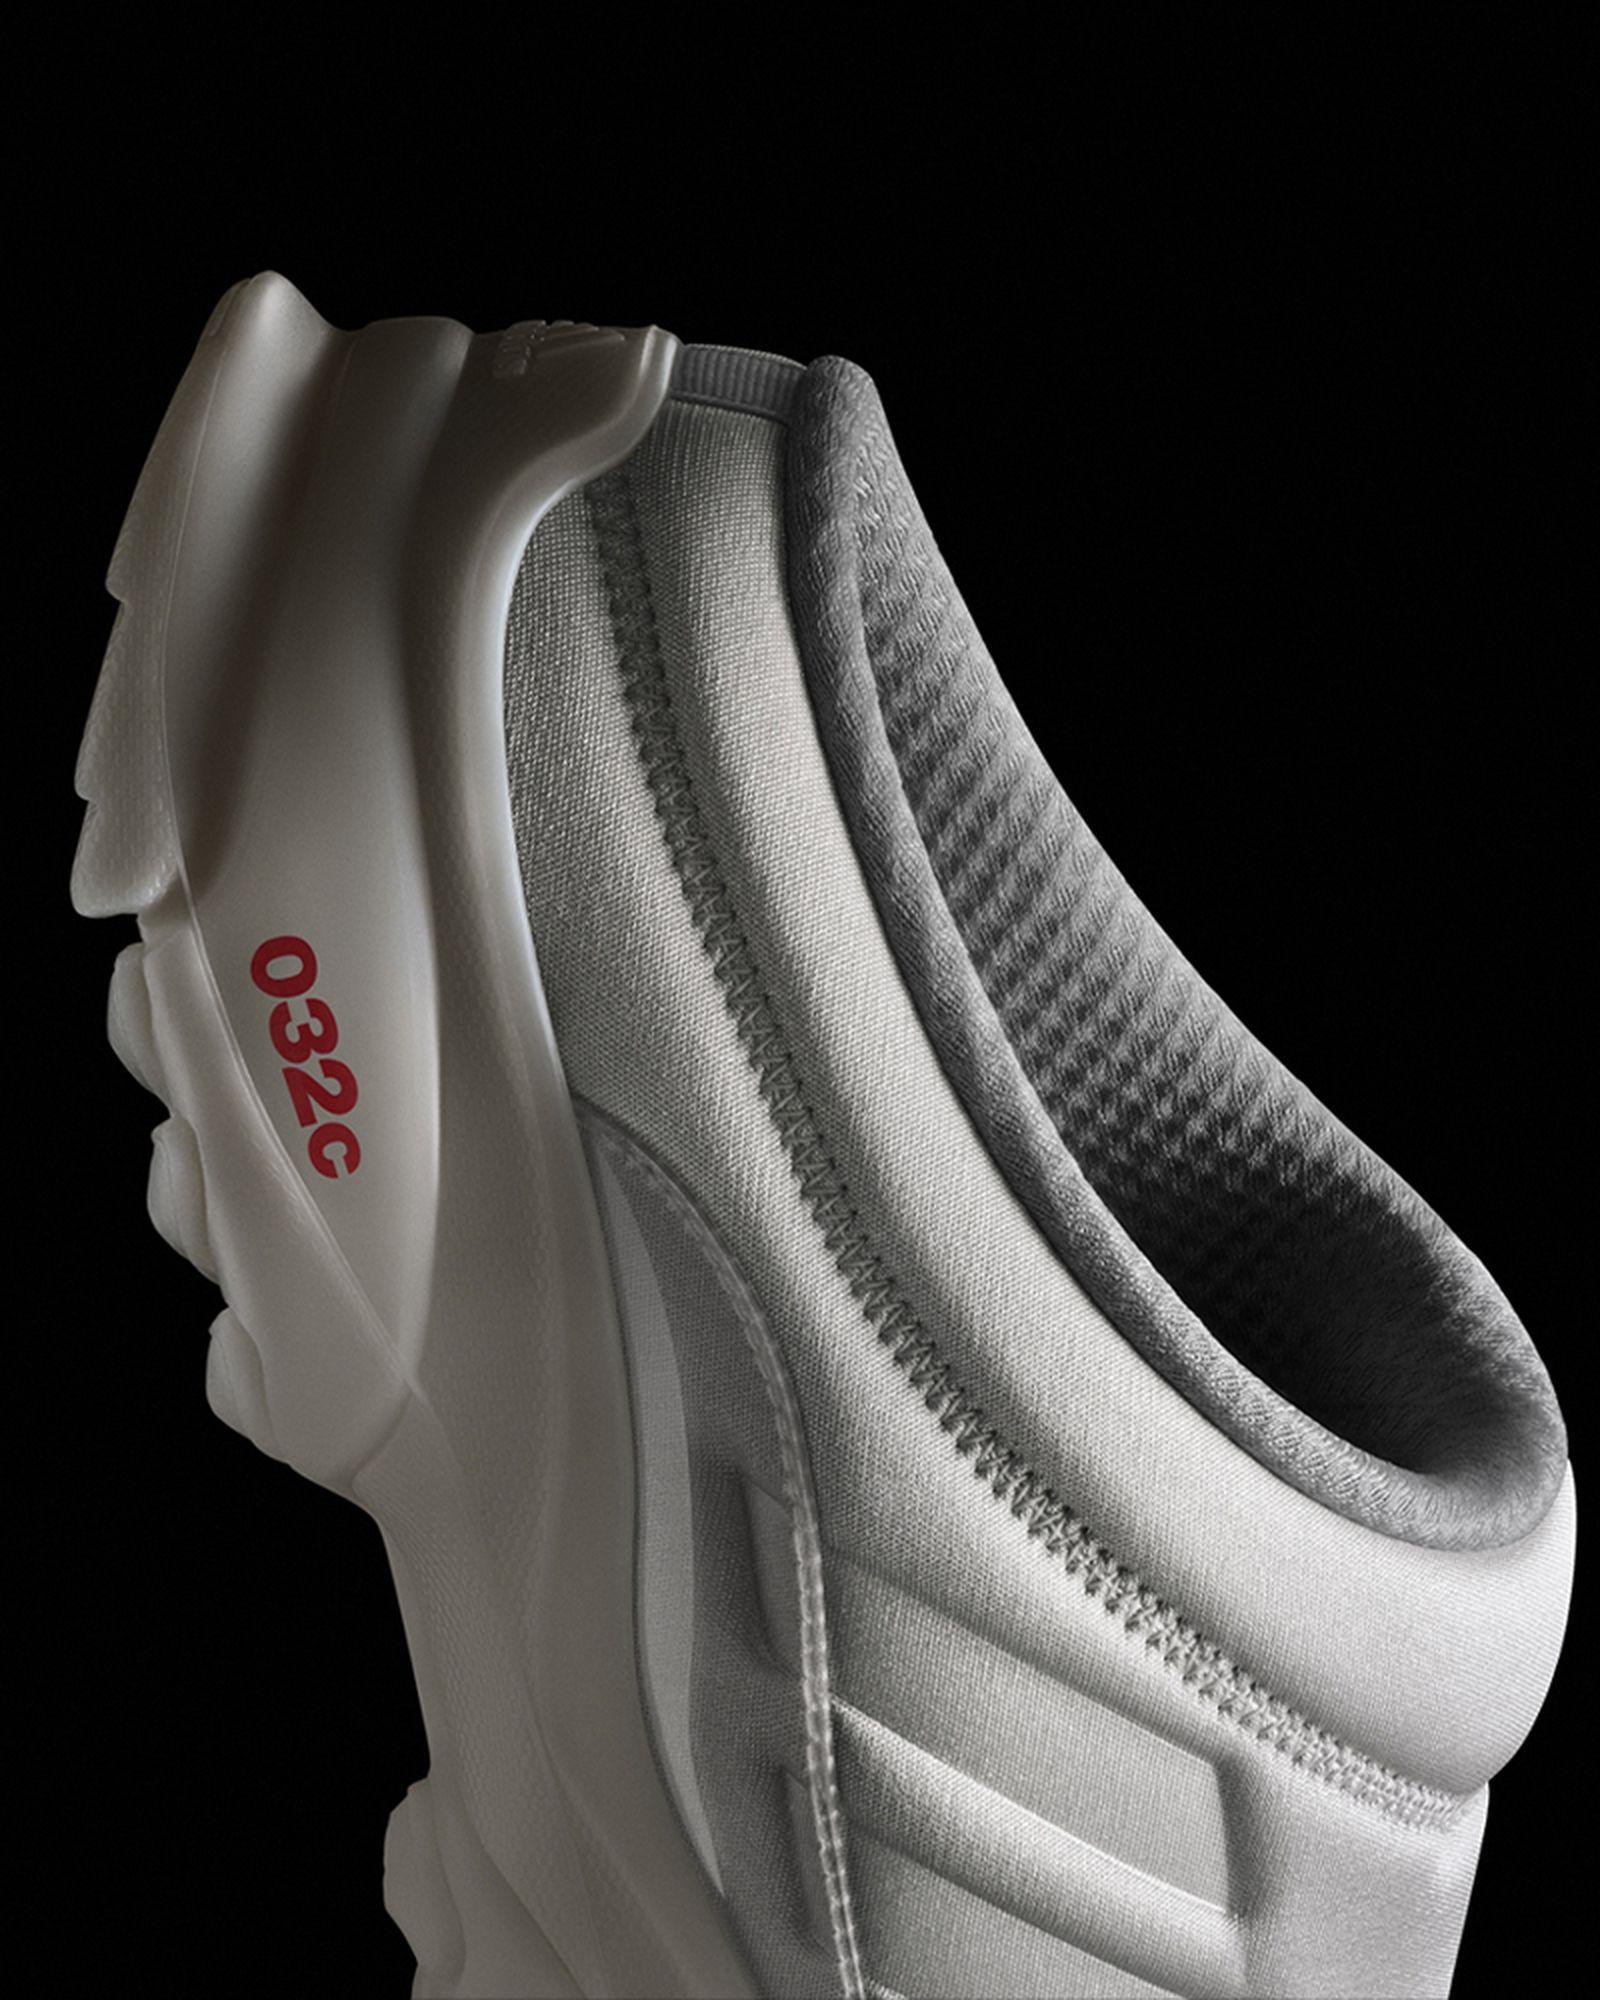 032c-adidas-02